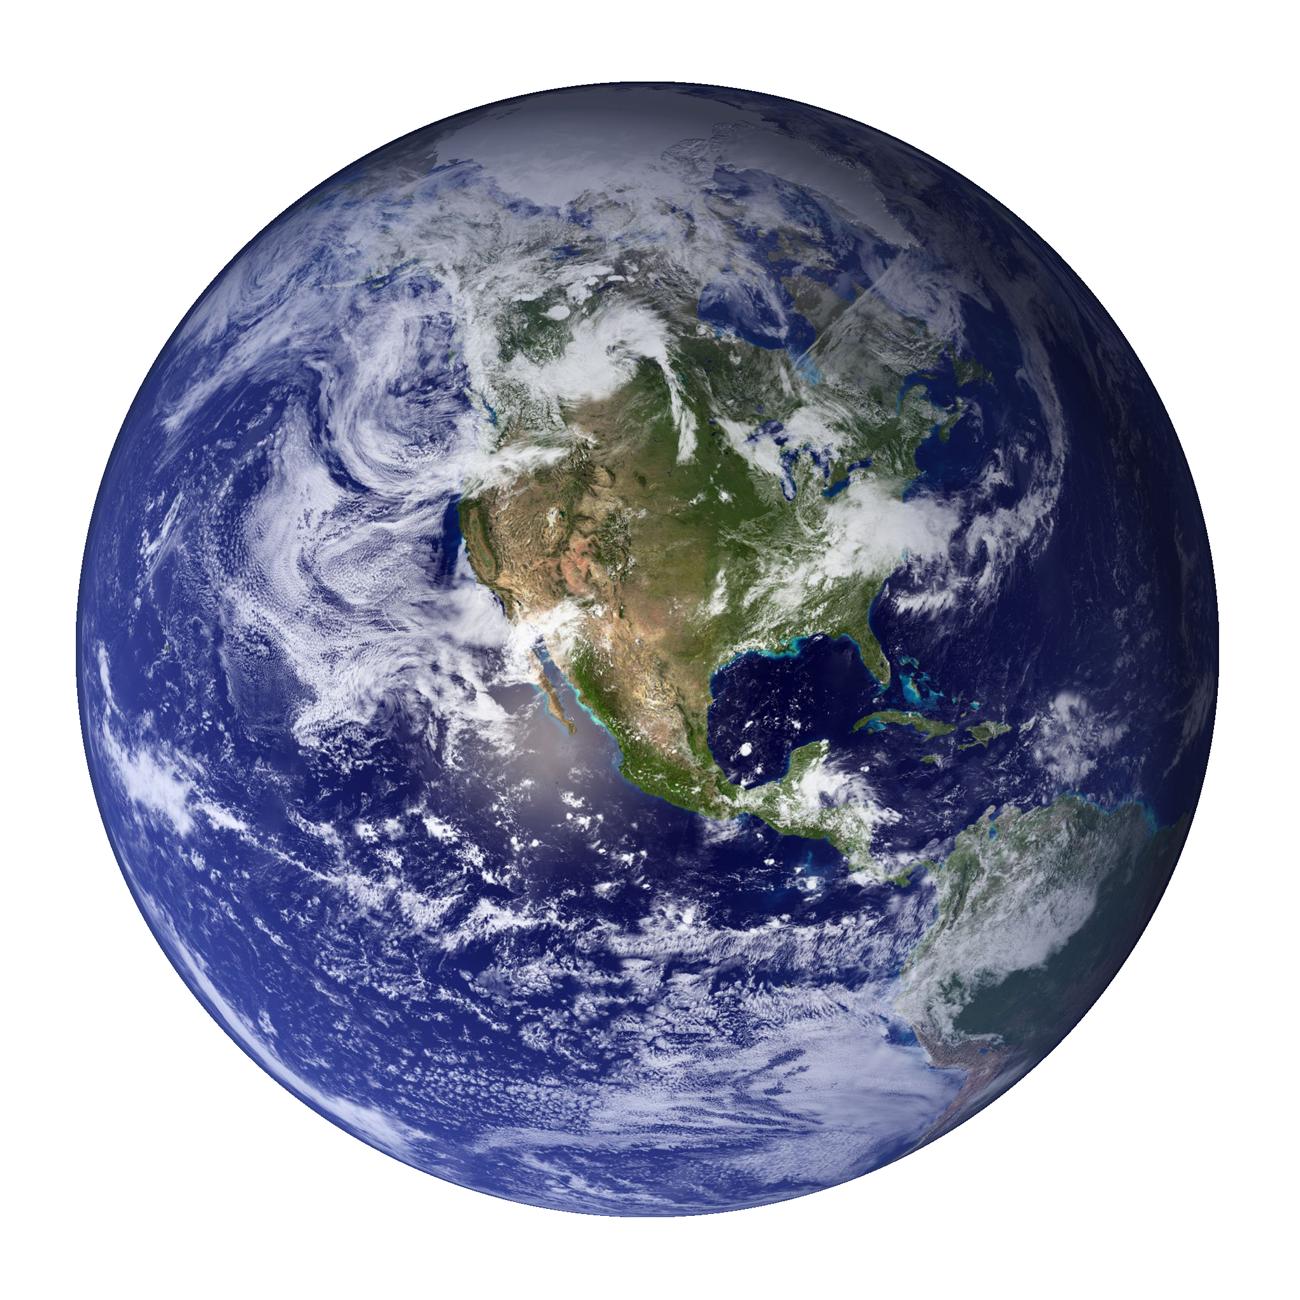 World: Earth Planet Globe World PNG Image - PurePNG